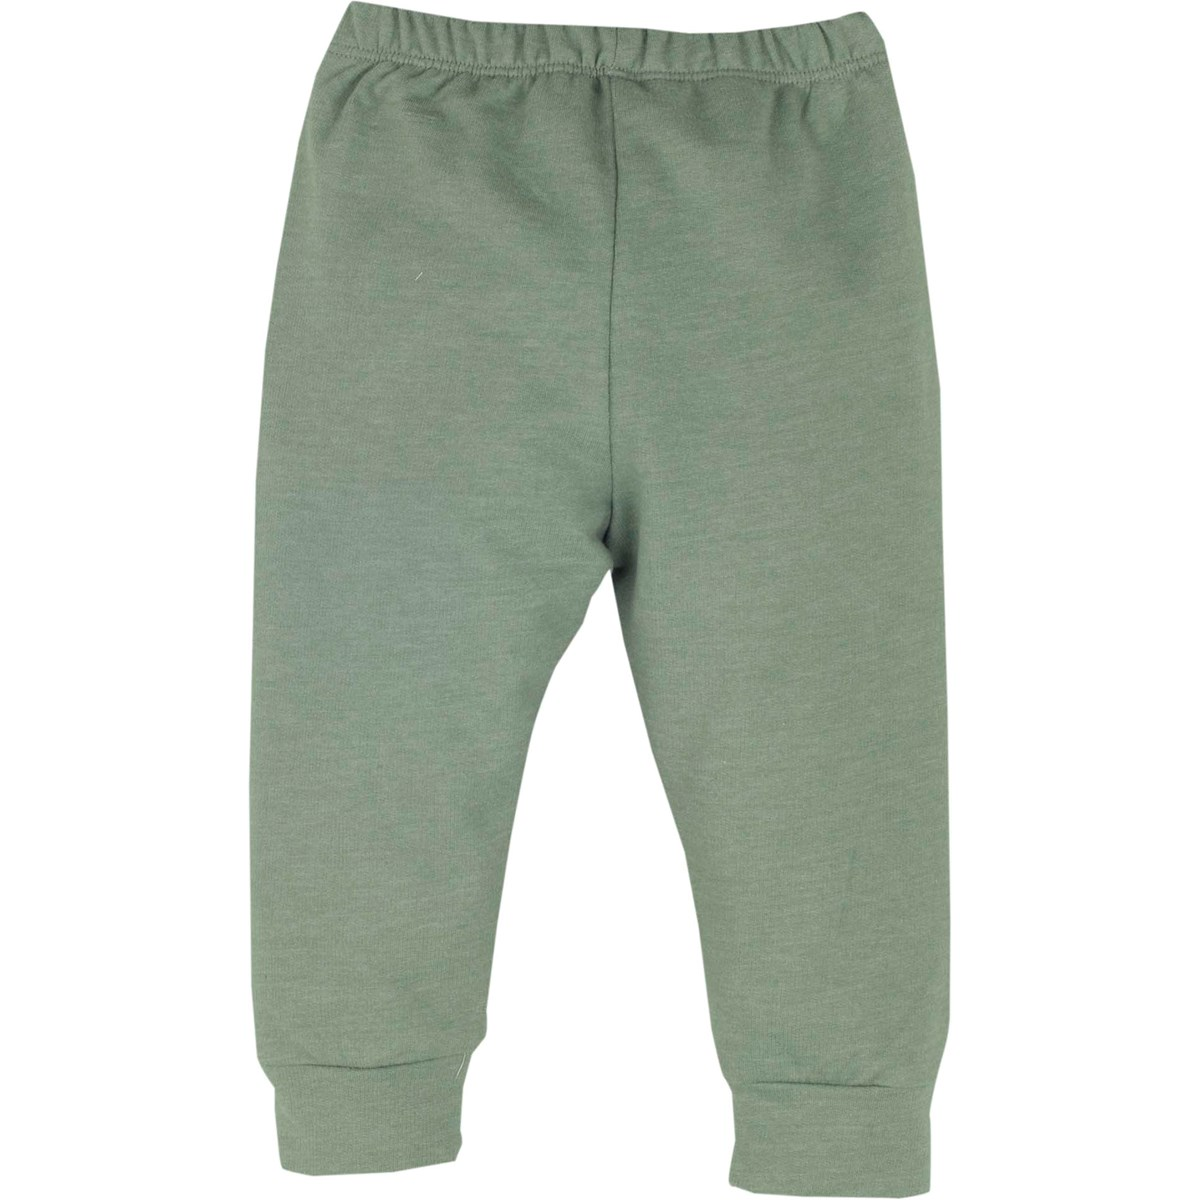 13891 Erkek Pijama Takim 4